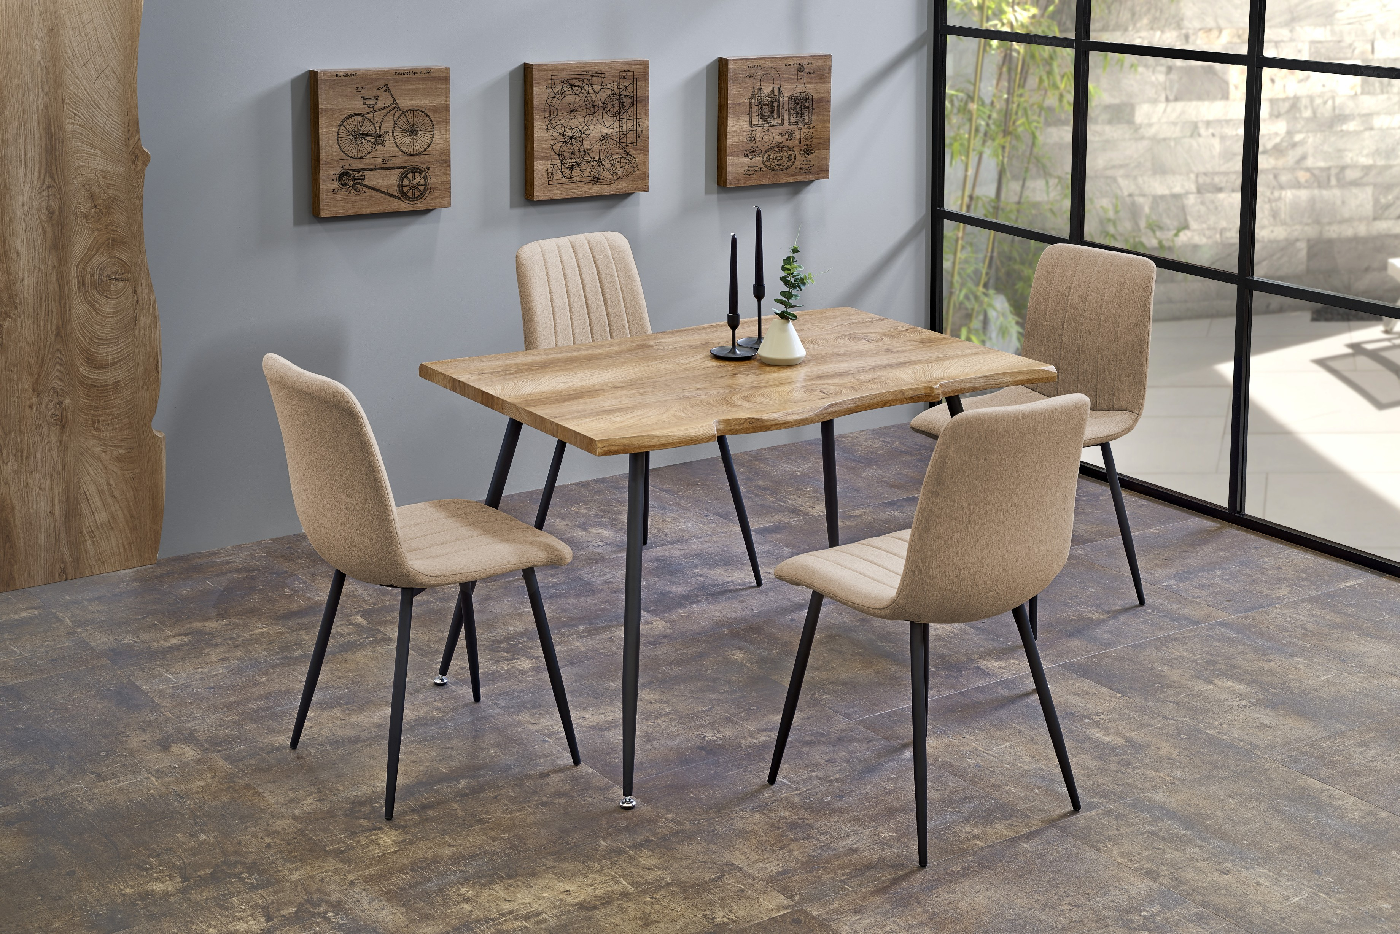 LARSON stół, blat - naturalny, nogi - czarny